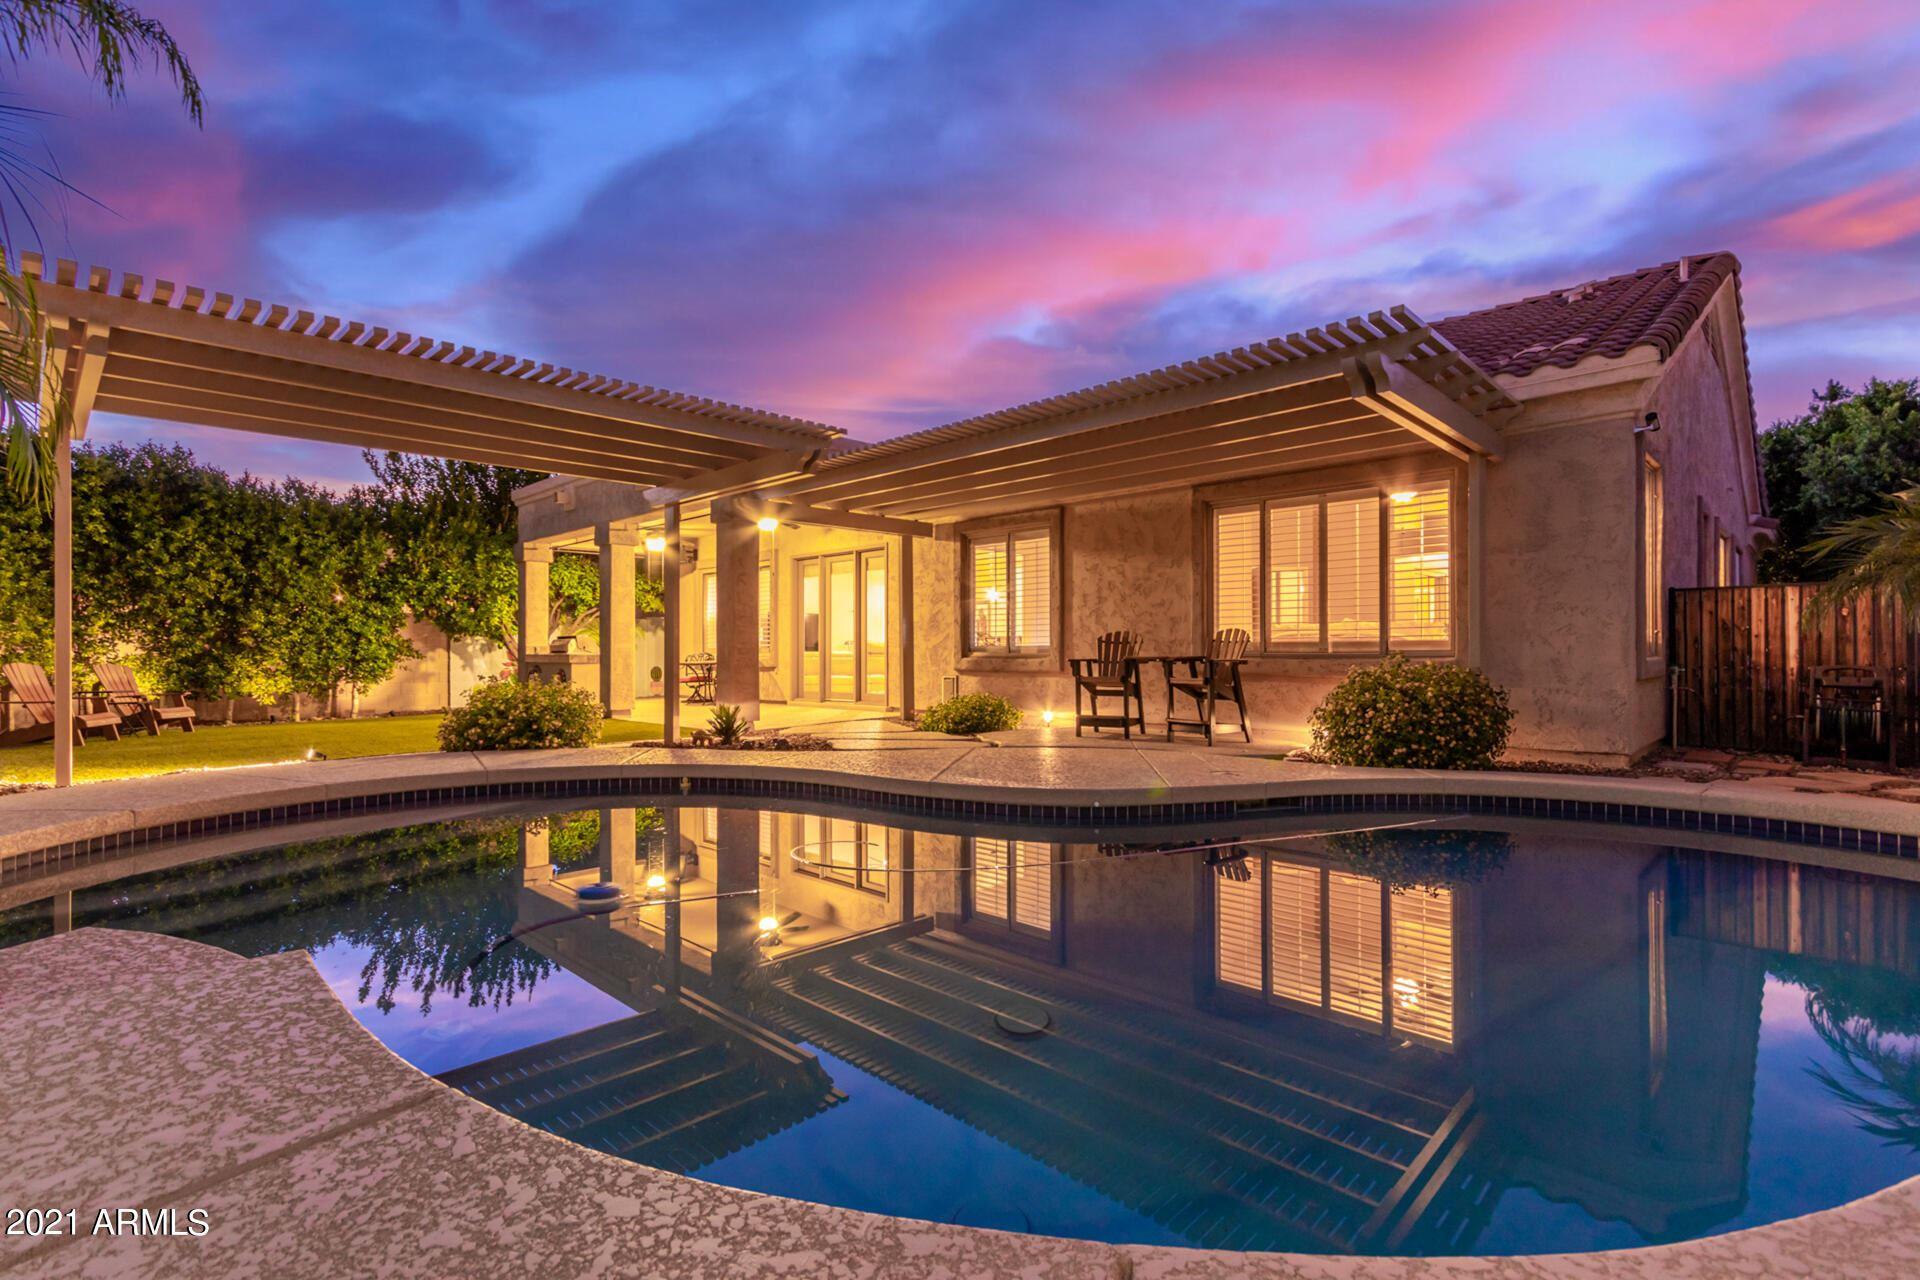 Photo of 6159 W SEQUOIA Drive, Glendale, AZ 85308 (MLS # 6296471)